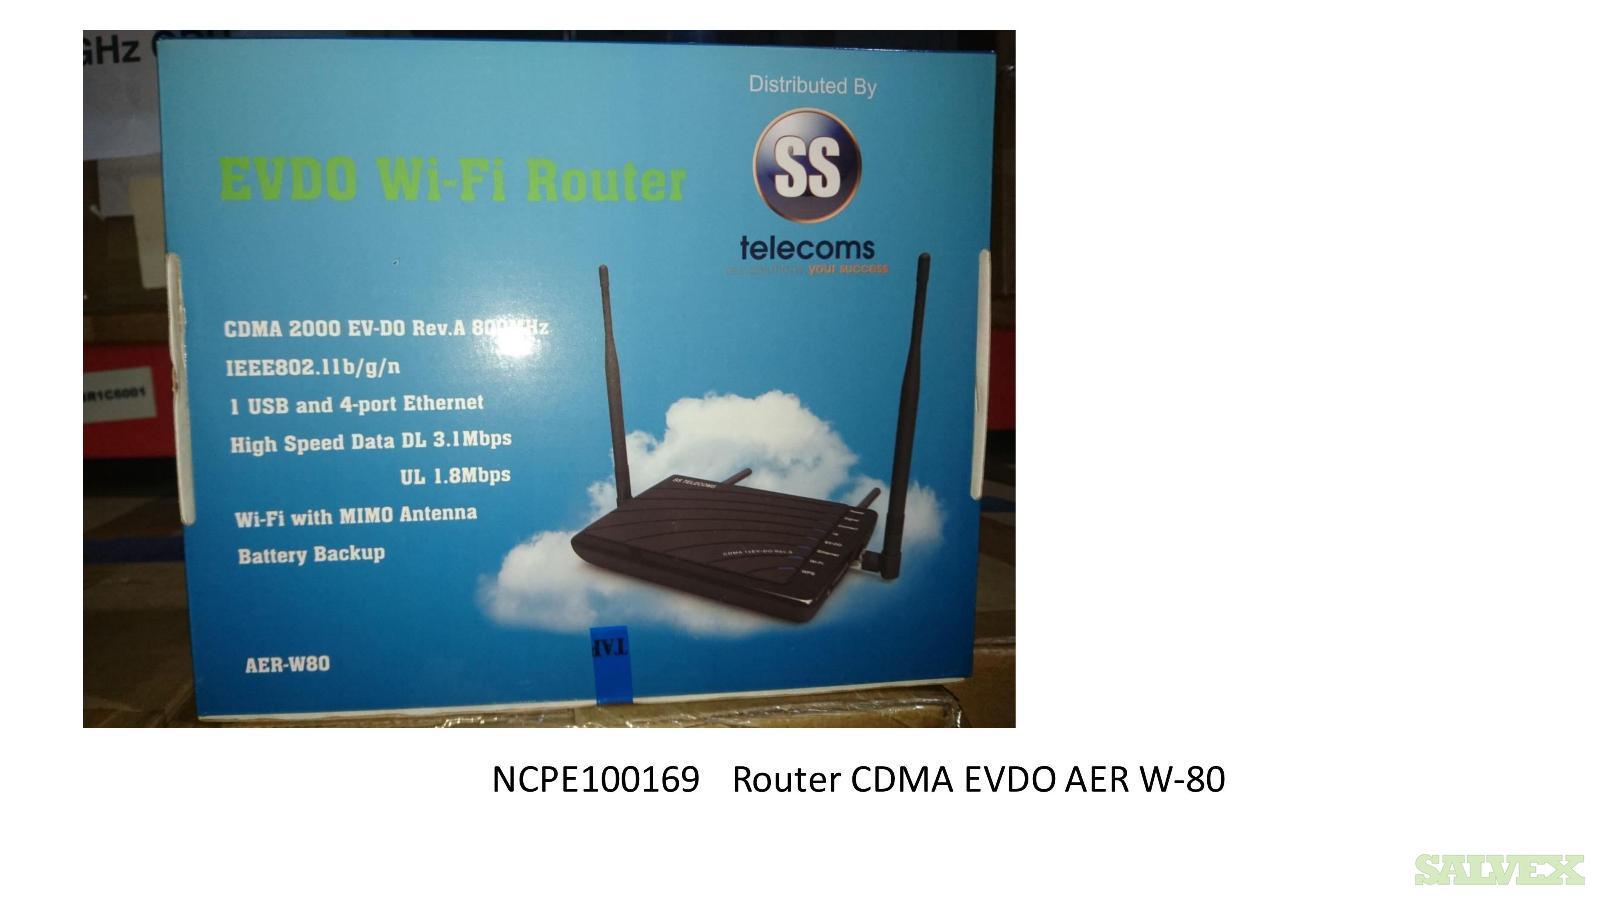 Telecommunications Equipment/Parts- Router CDMA, CAB-PWR-ZA, ZTE AC2787 USB Data Stick, Huawei F261 Docking Station and many more